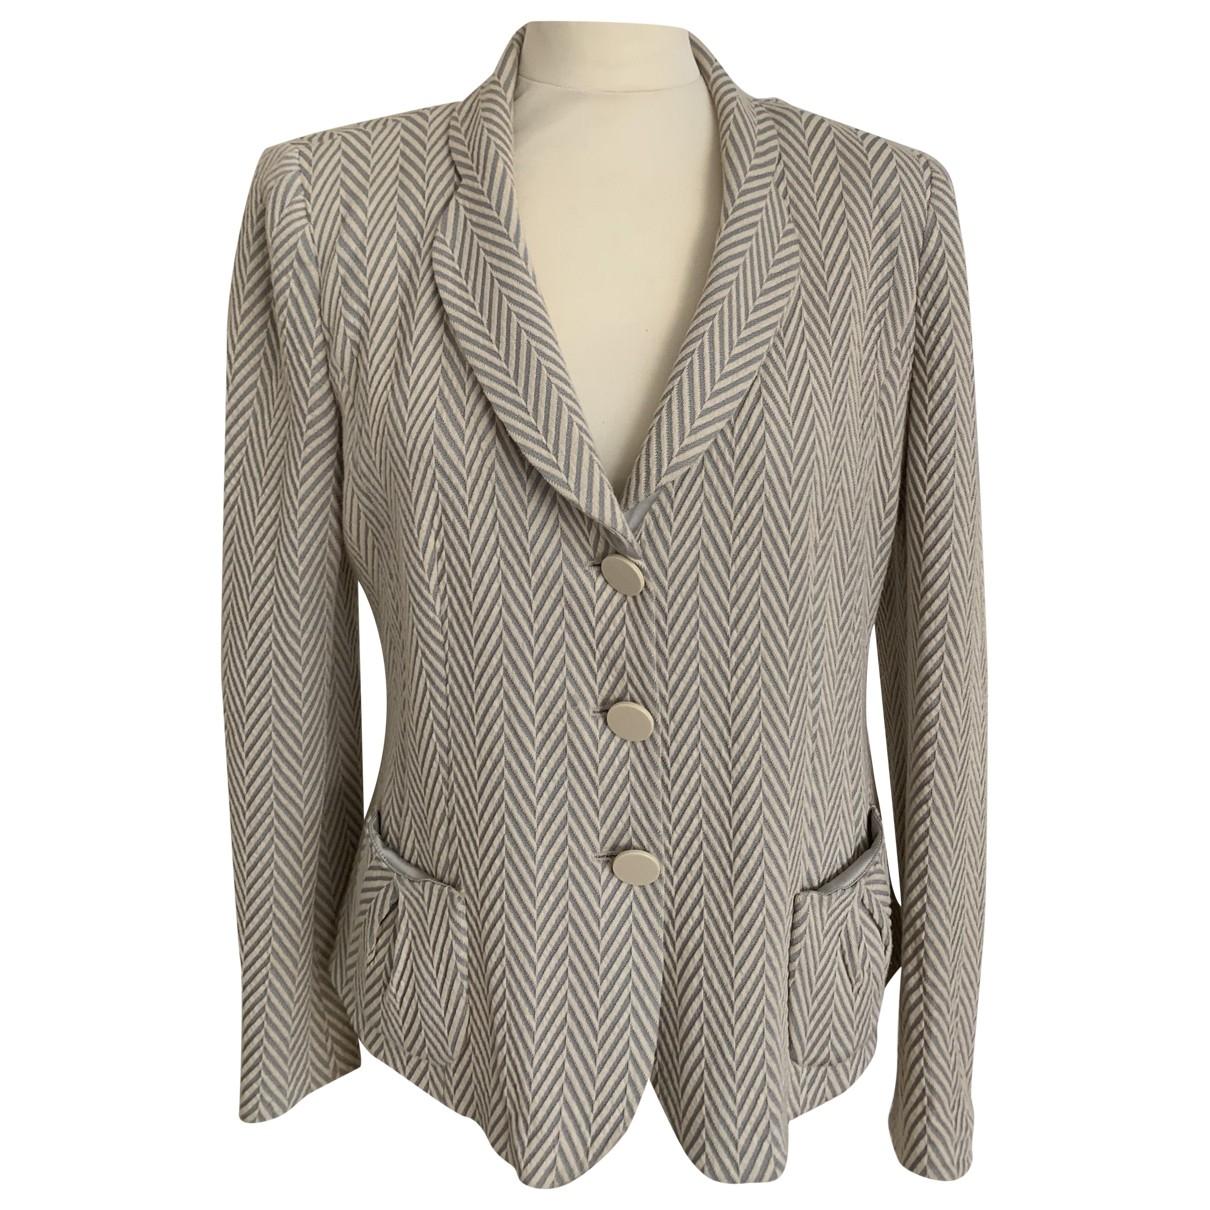 Armani Collezioni \N Multicolour Cotton jacket for Women 48 IT